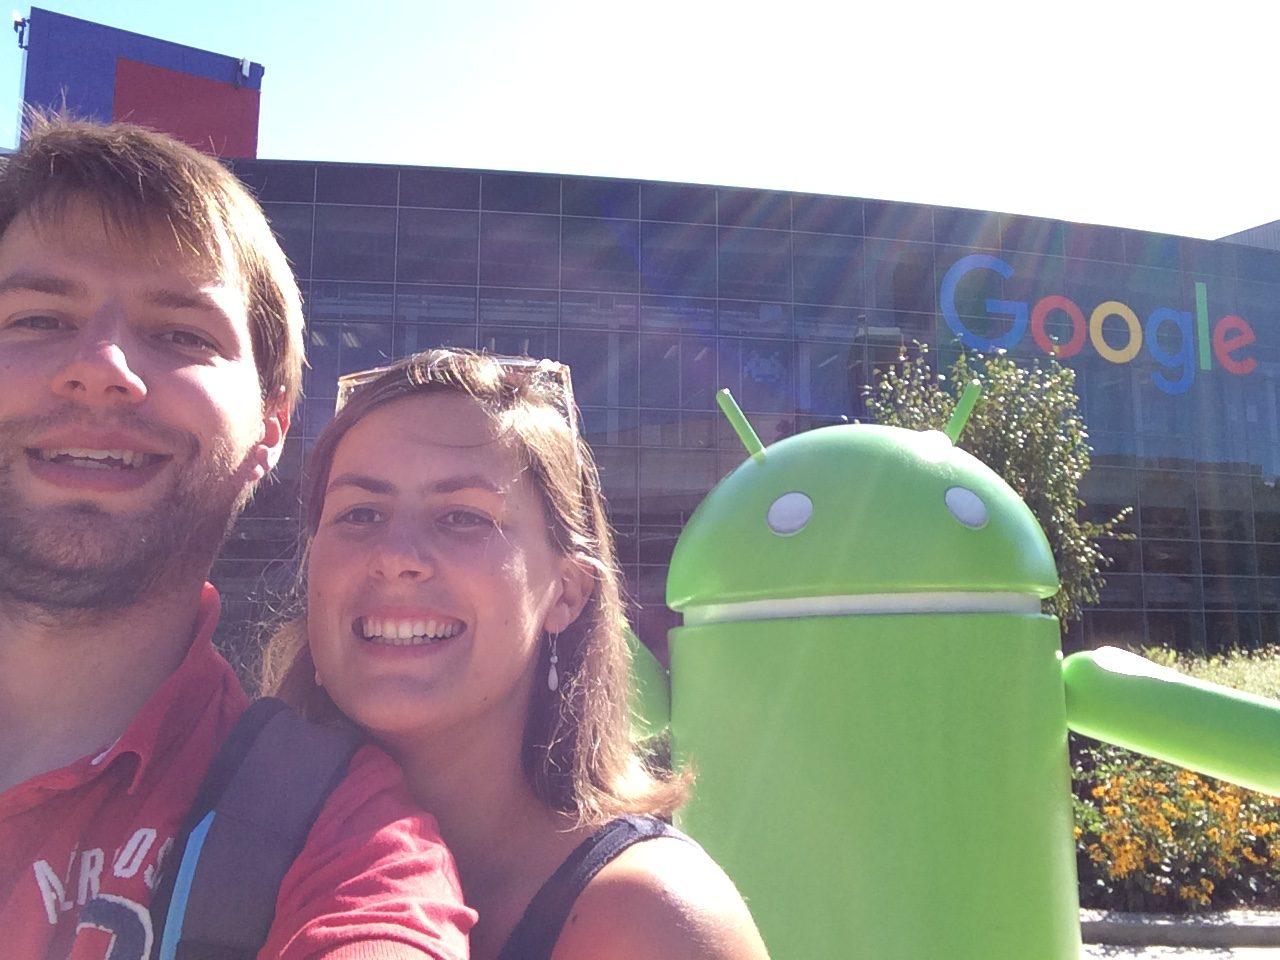 Google Campus, San Fransisco, Californie, USA